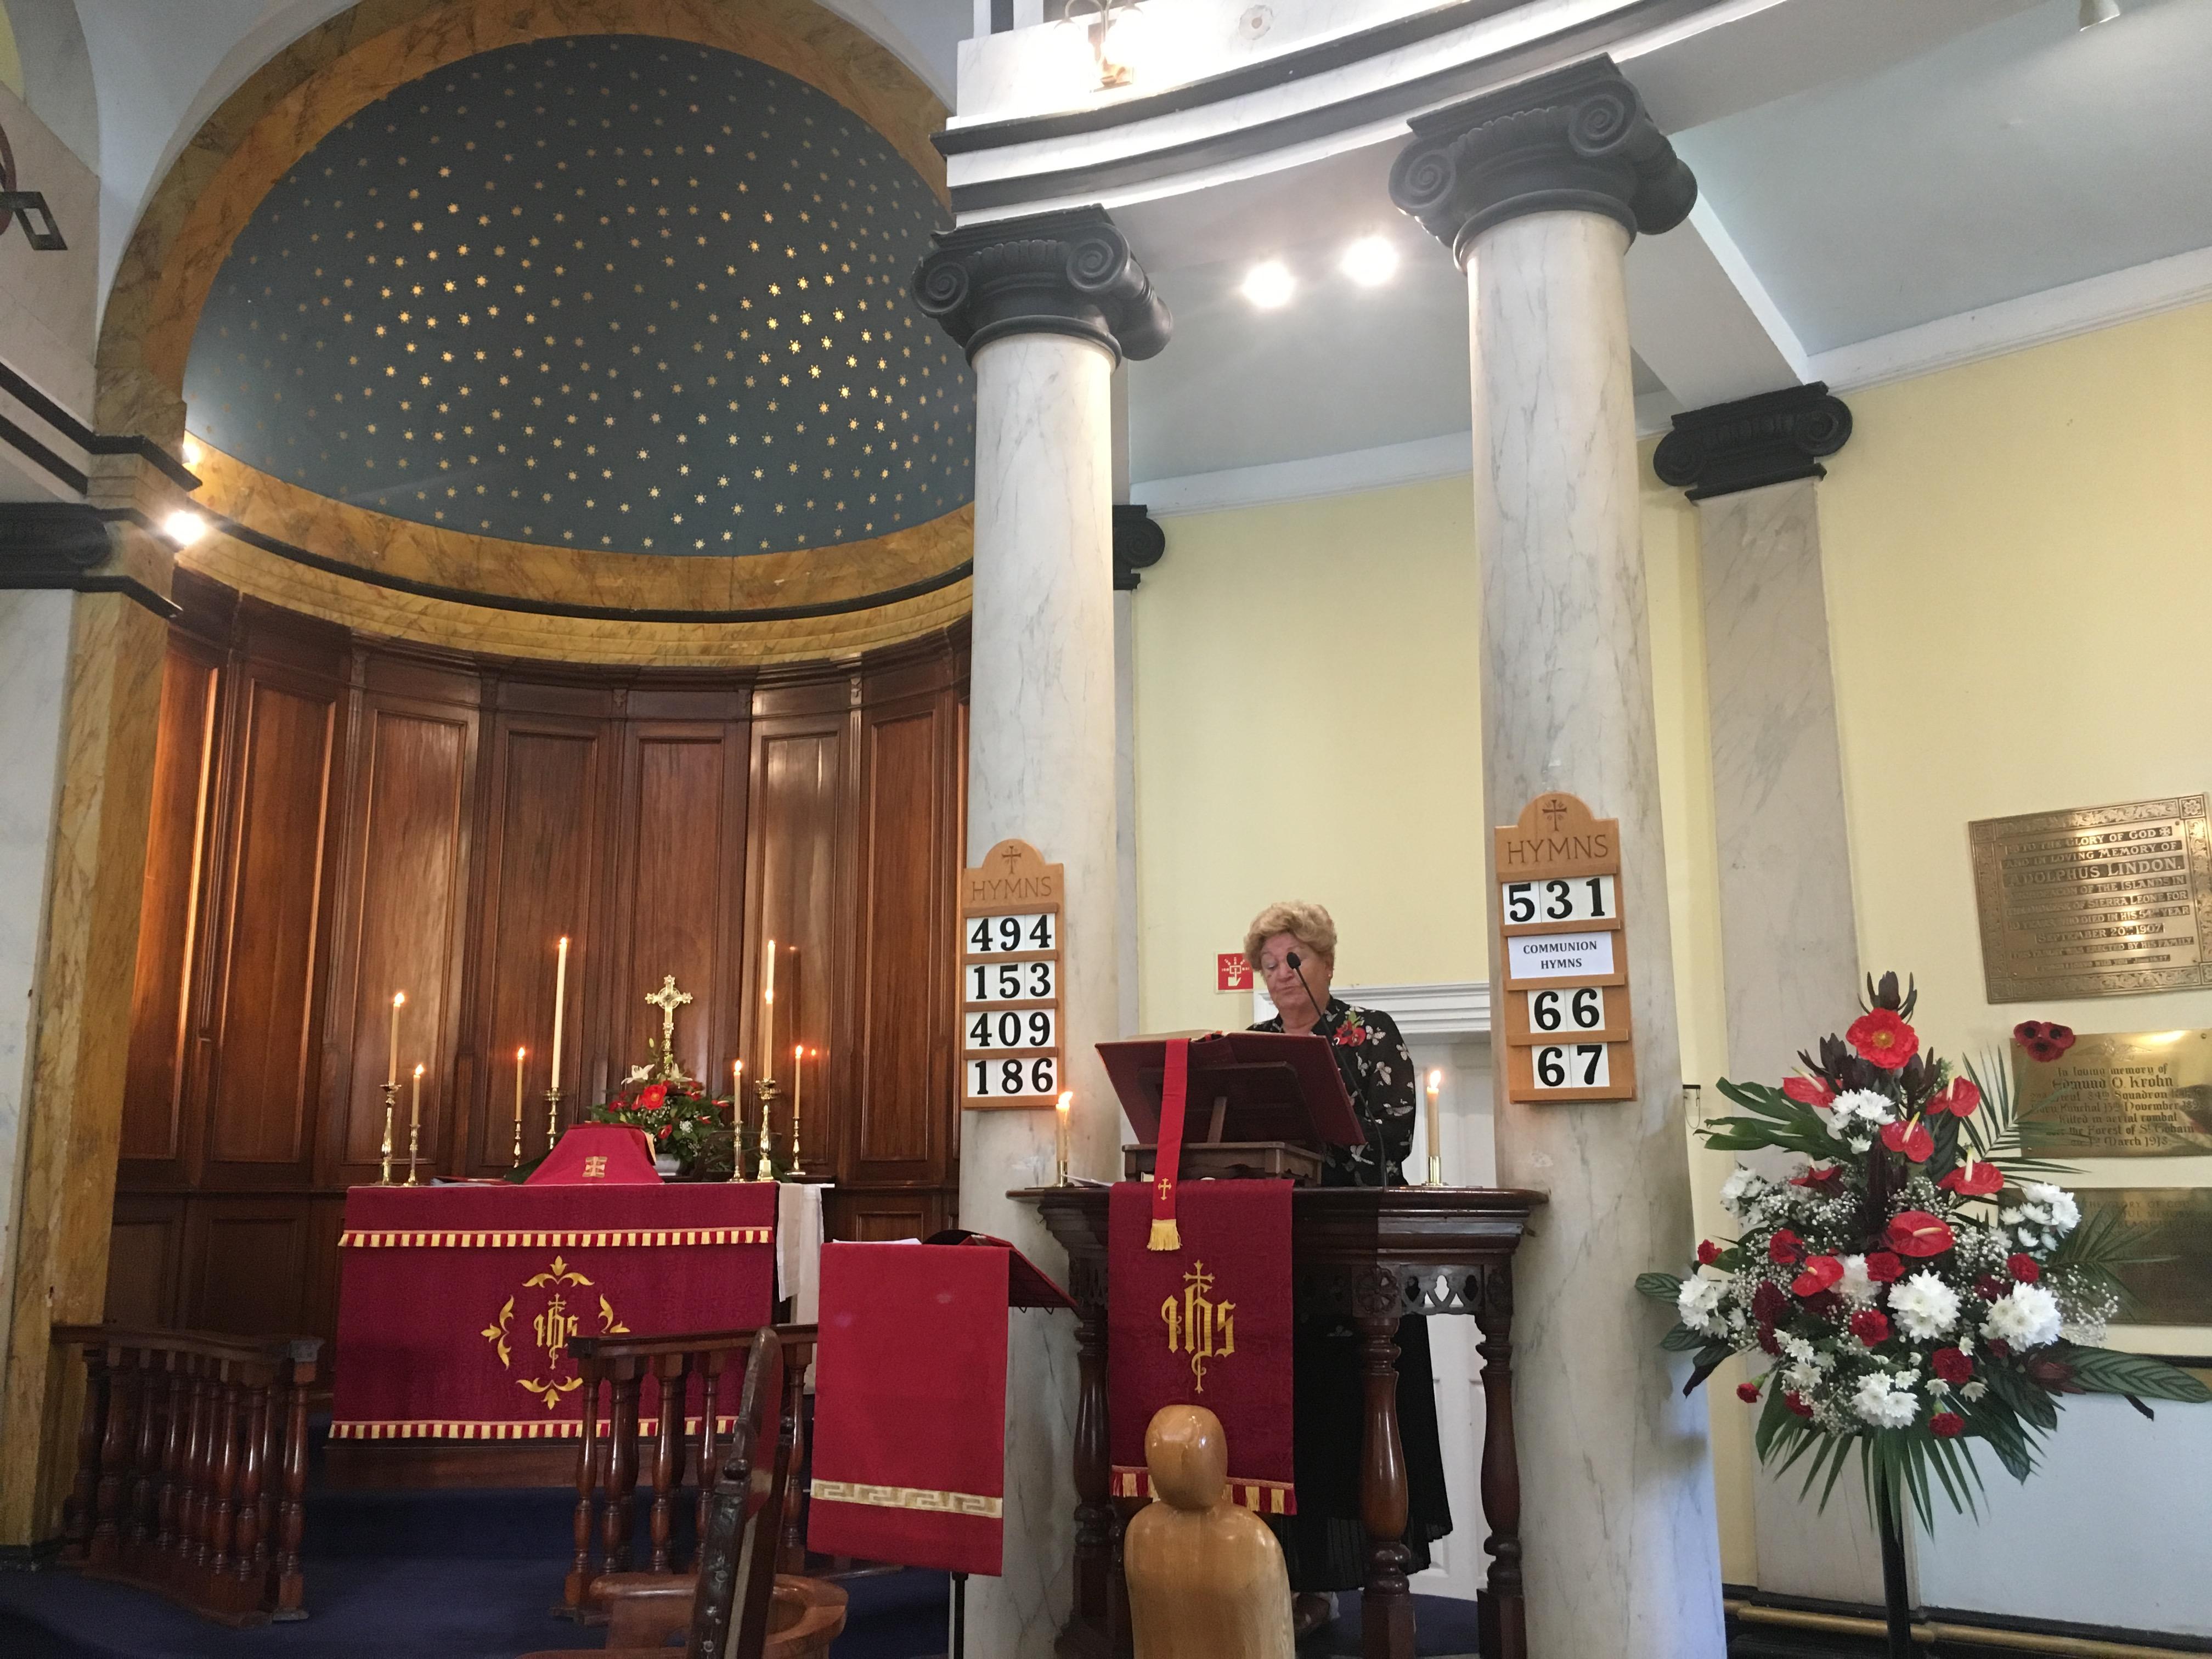 Poetry Reading by Susan Marloye-James